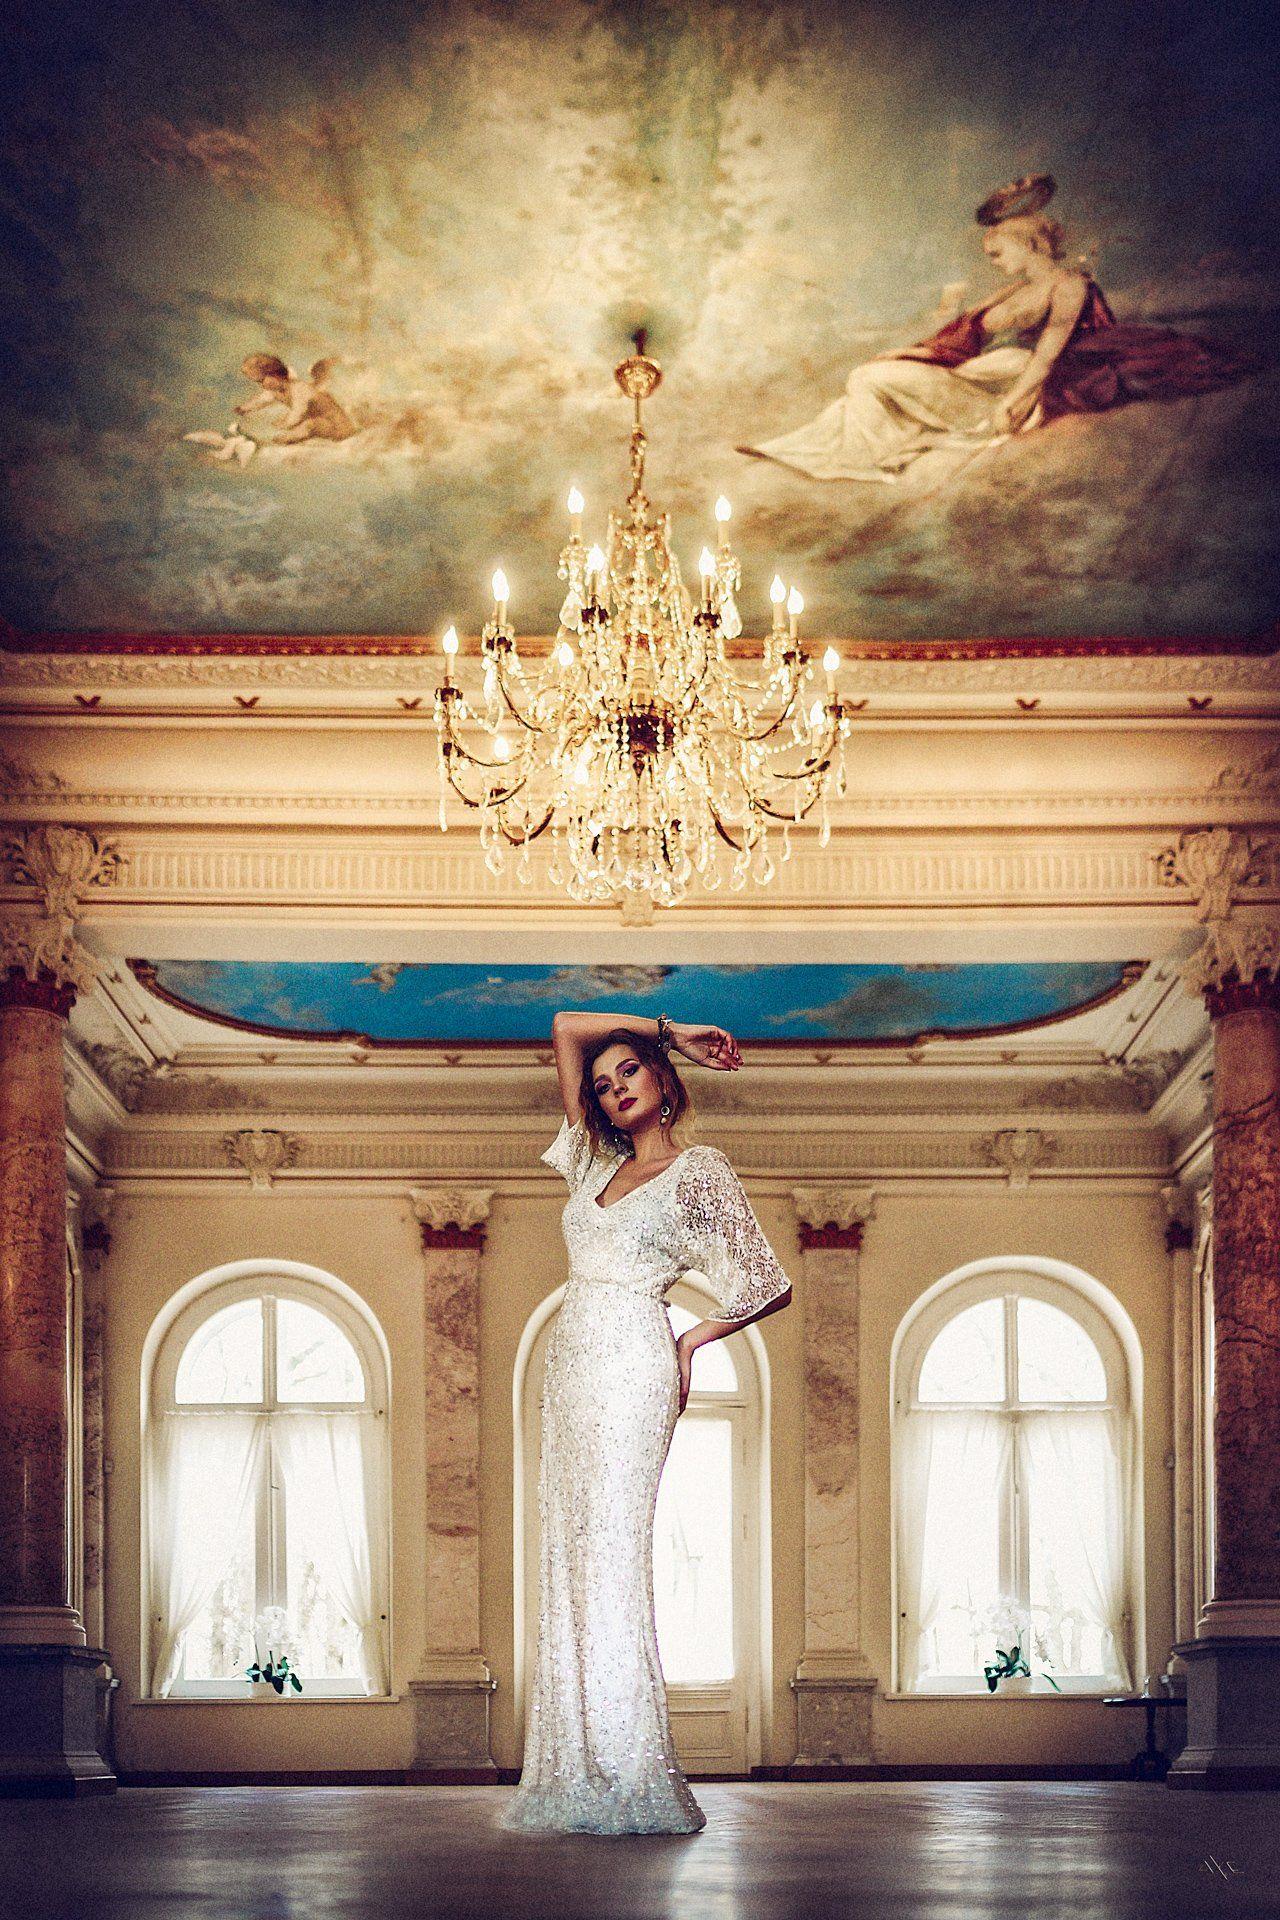 Dress, Lithuania, Old manor, Portrait, Woman, Руслан Болгов (Axe)